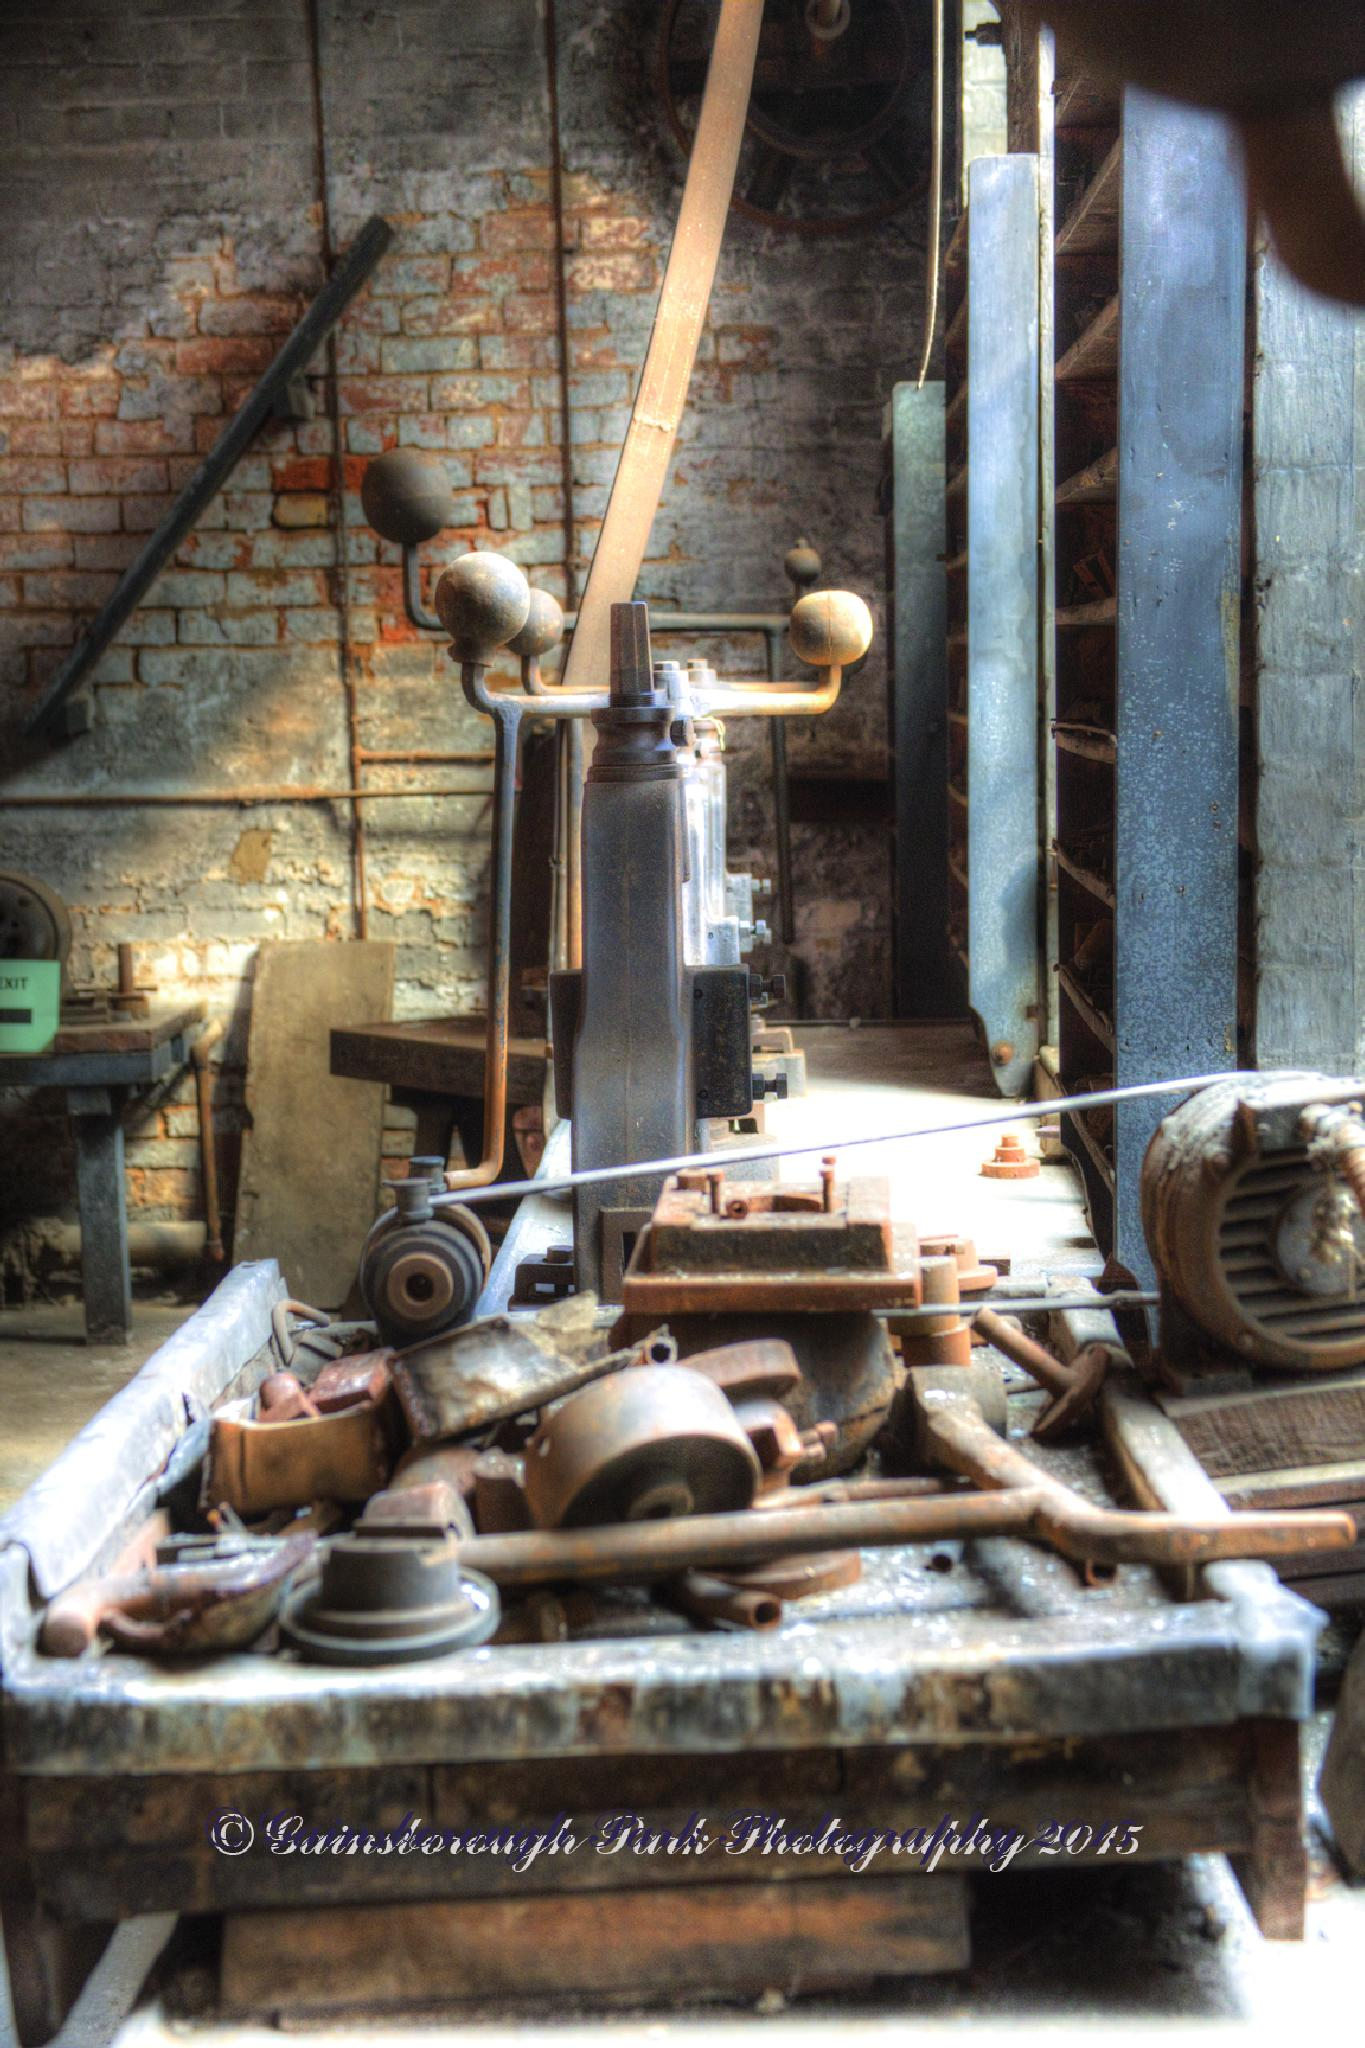 Jeweller's Workshop by Gainsborough Park Photography